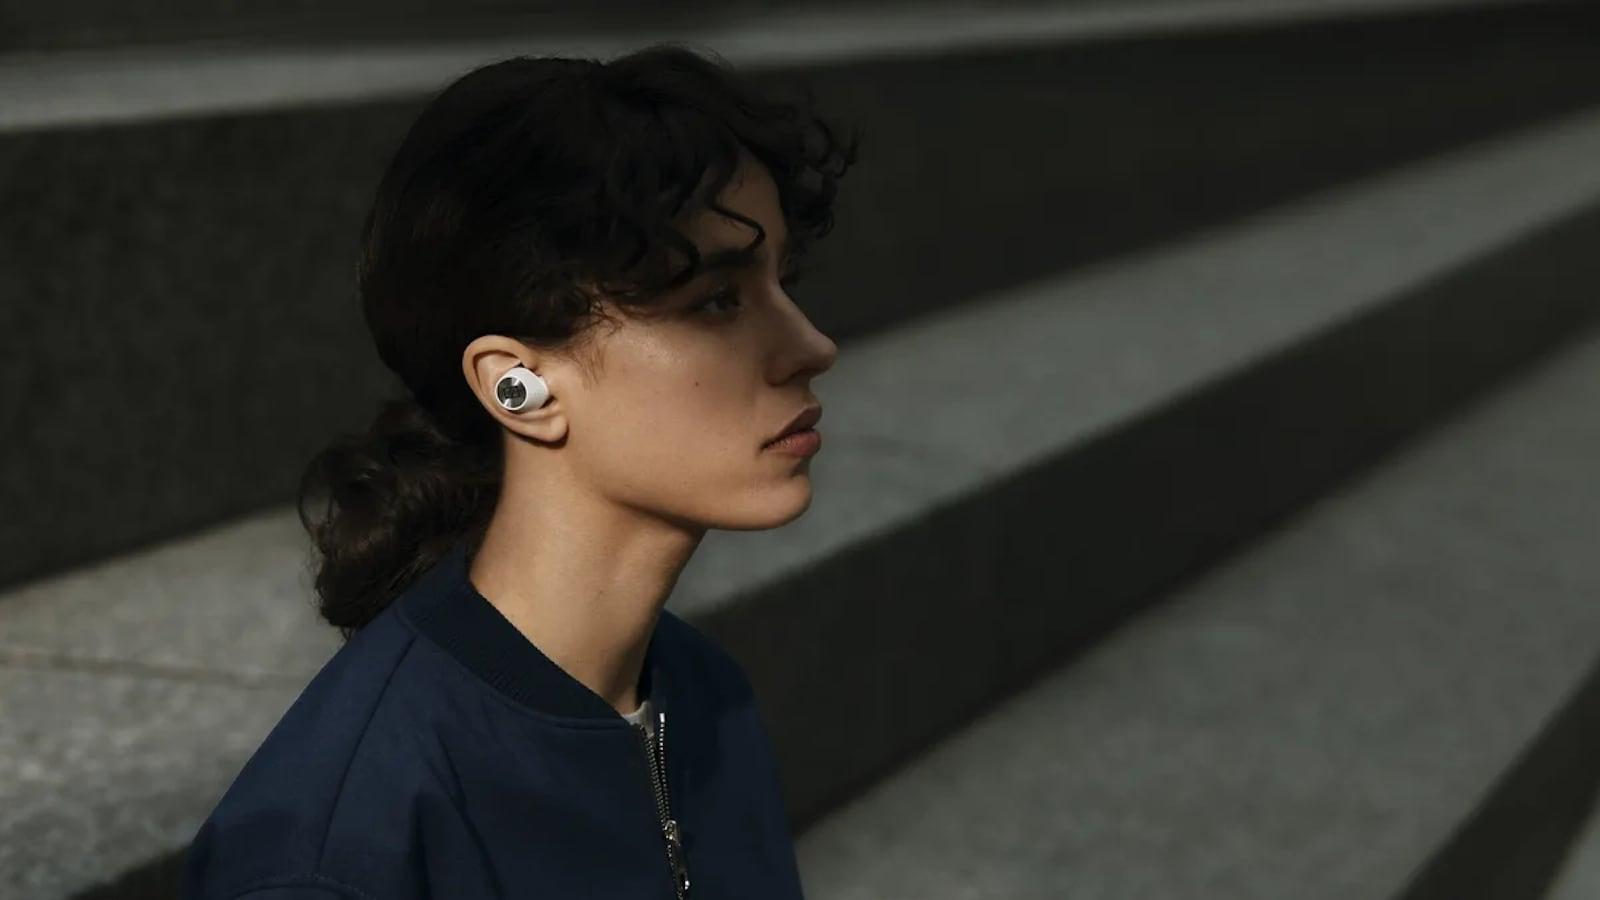 Sennheiser MOMENTUM True Wireless 2 Finely Crafted Earbuds